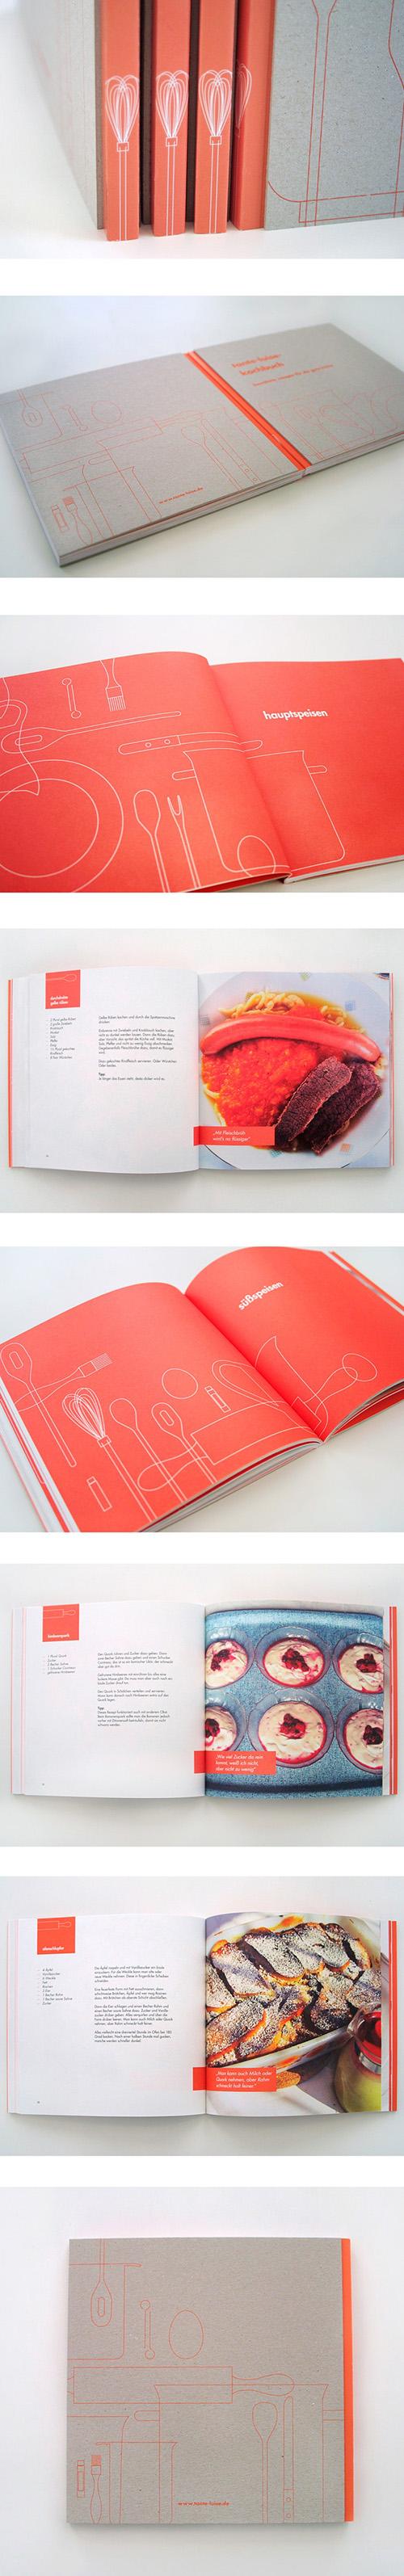 Tante Luise cookbook